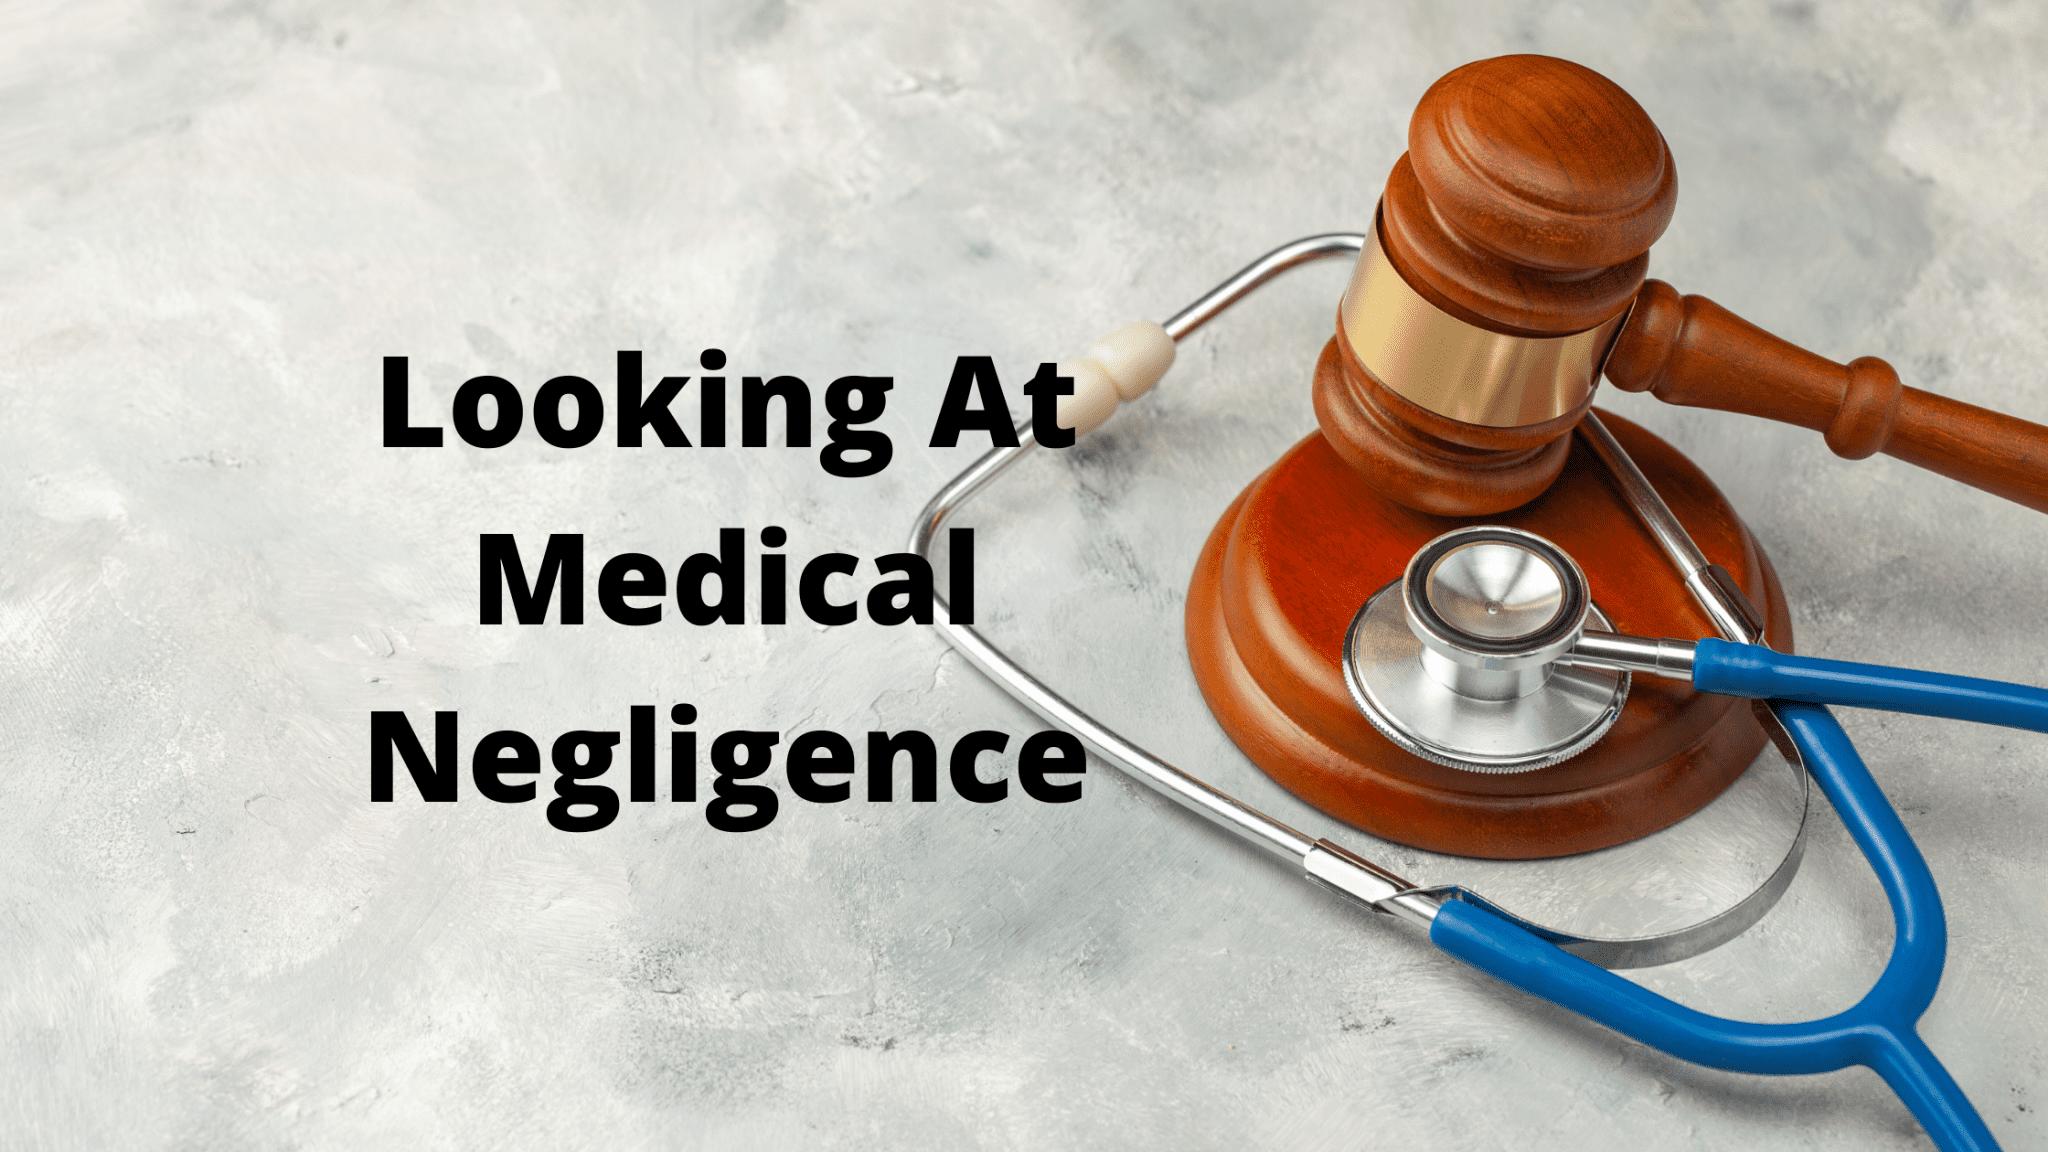 Looking At Medical Negligence